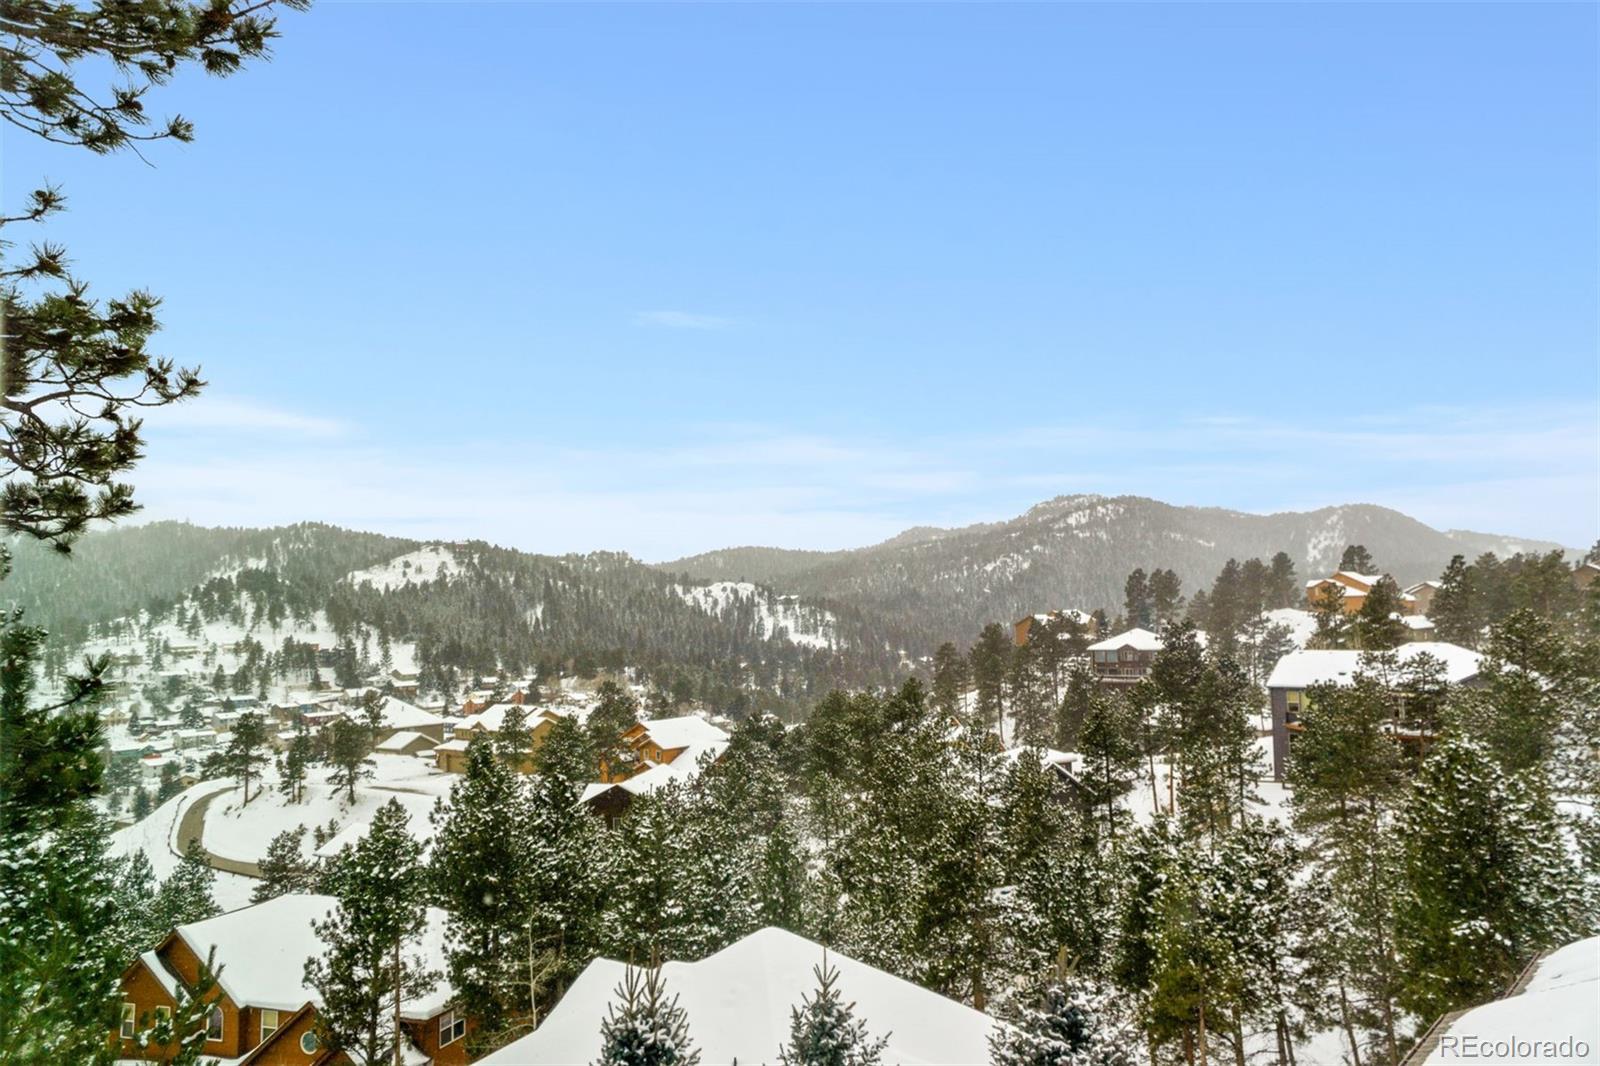 MLS# 6735710 - 7 - 26176 Sweetbriar Trail, Evergreen, CO 80439